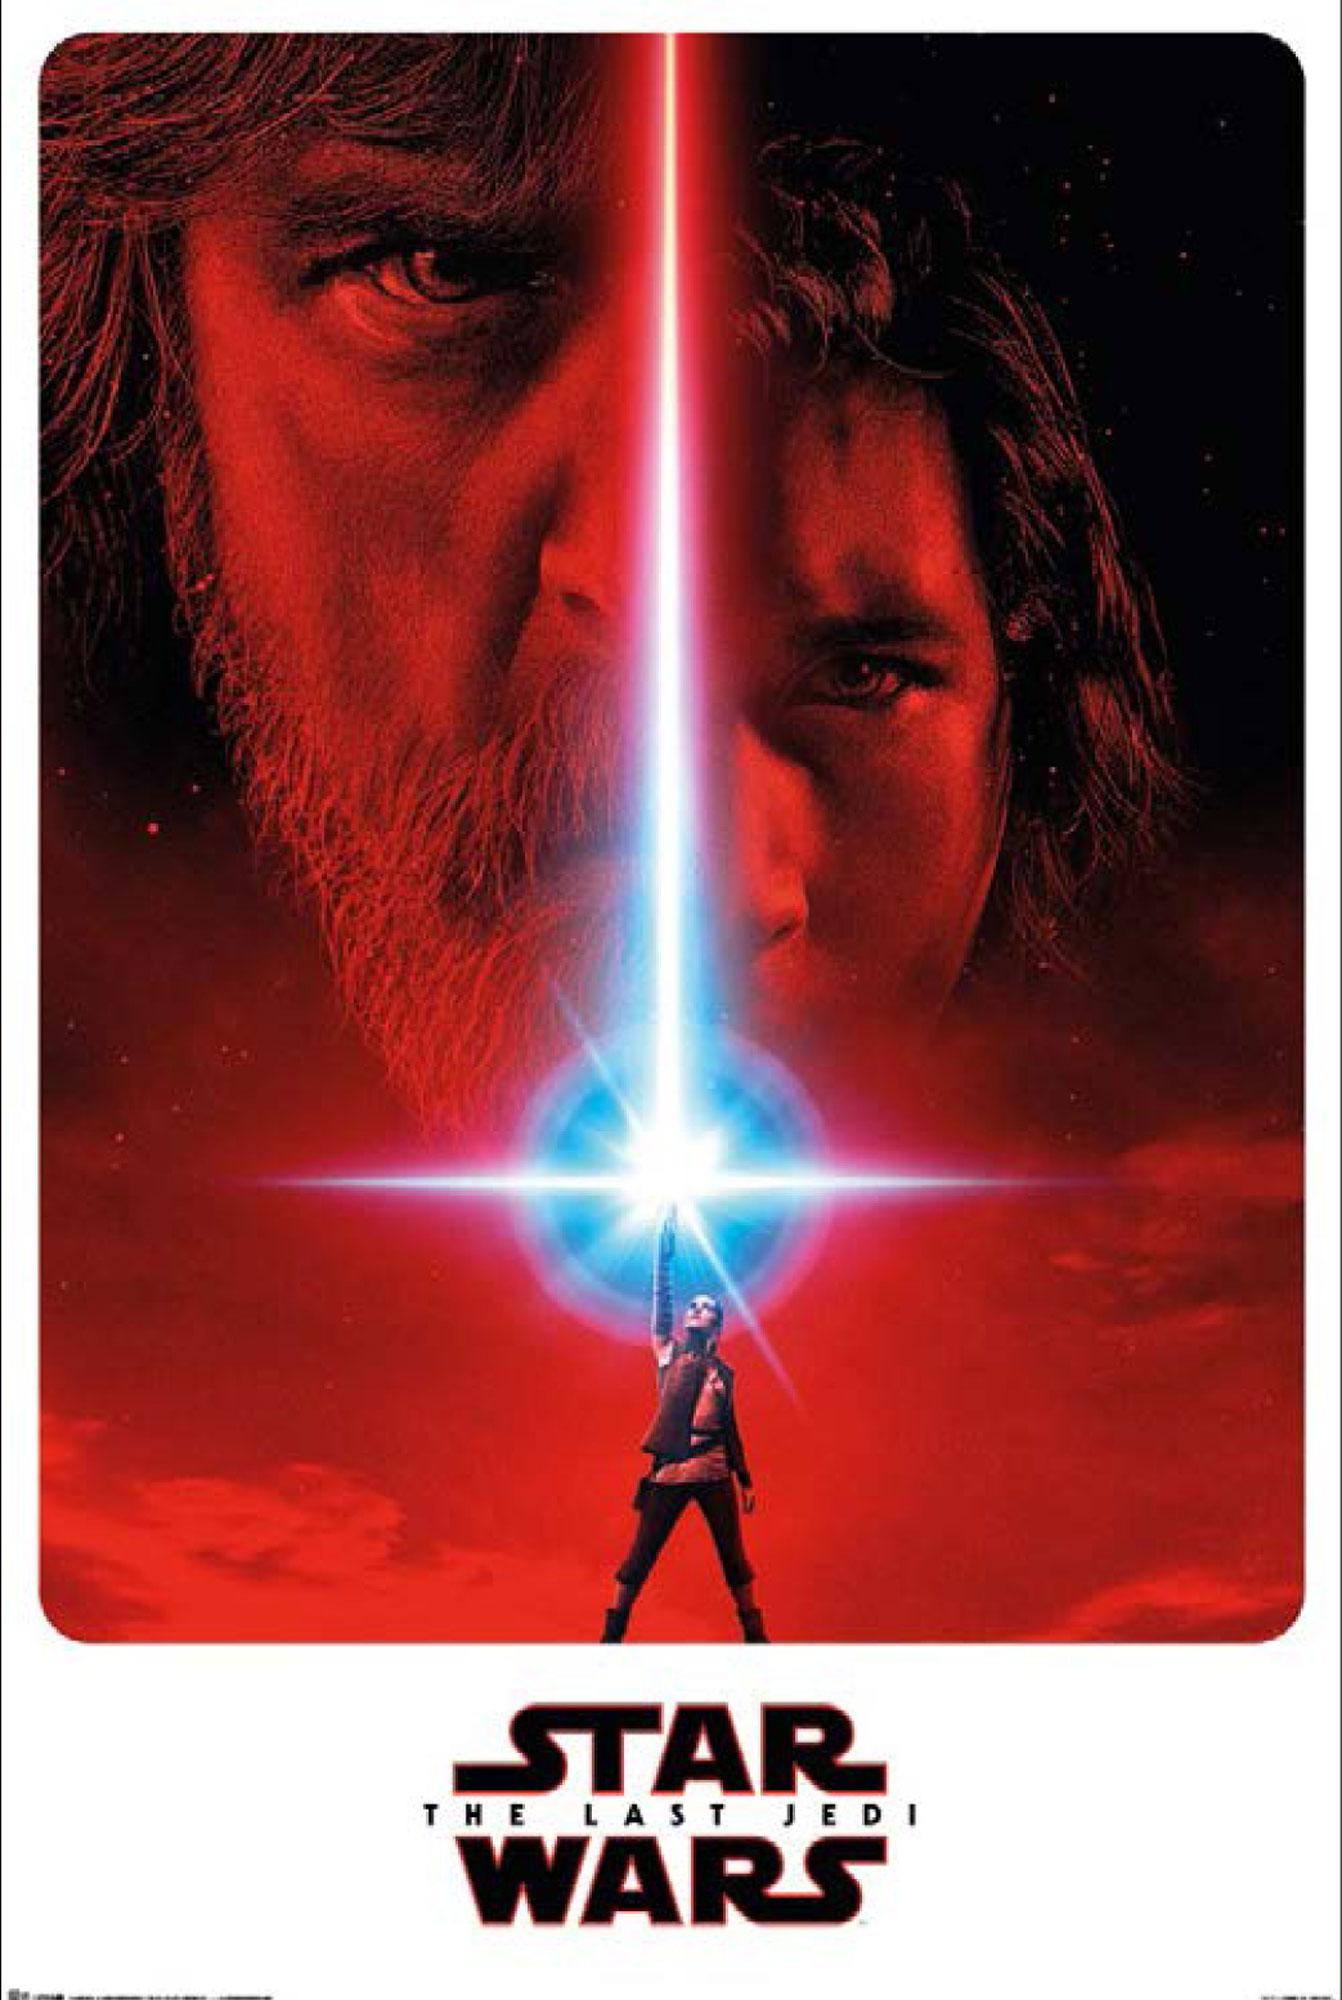 Star Wars - The Last Jedi - Teaser - Poster Plakat - Größe 61x91,5 ...